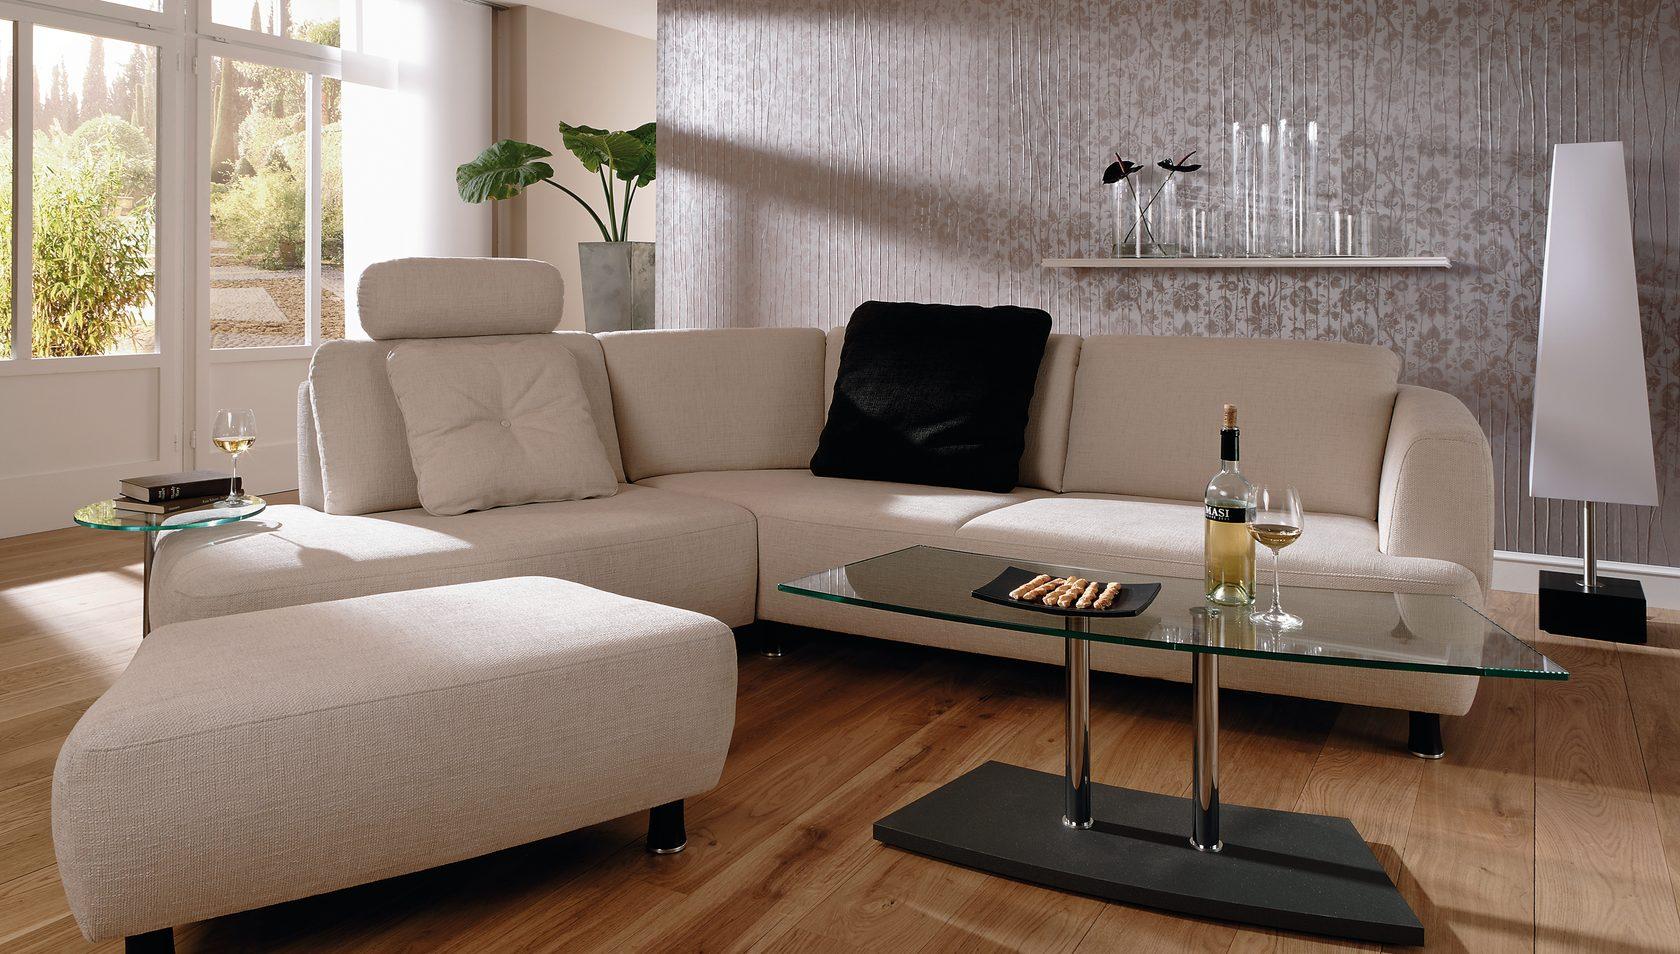 ol ron meubles mr150 ol ron meubles. Black Bedroom Furniture Sets. Home Design Ideas